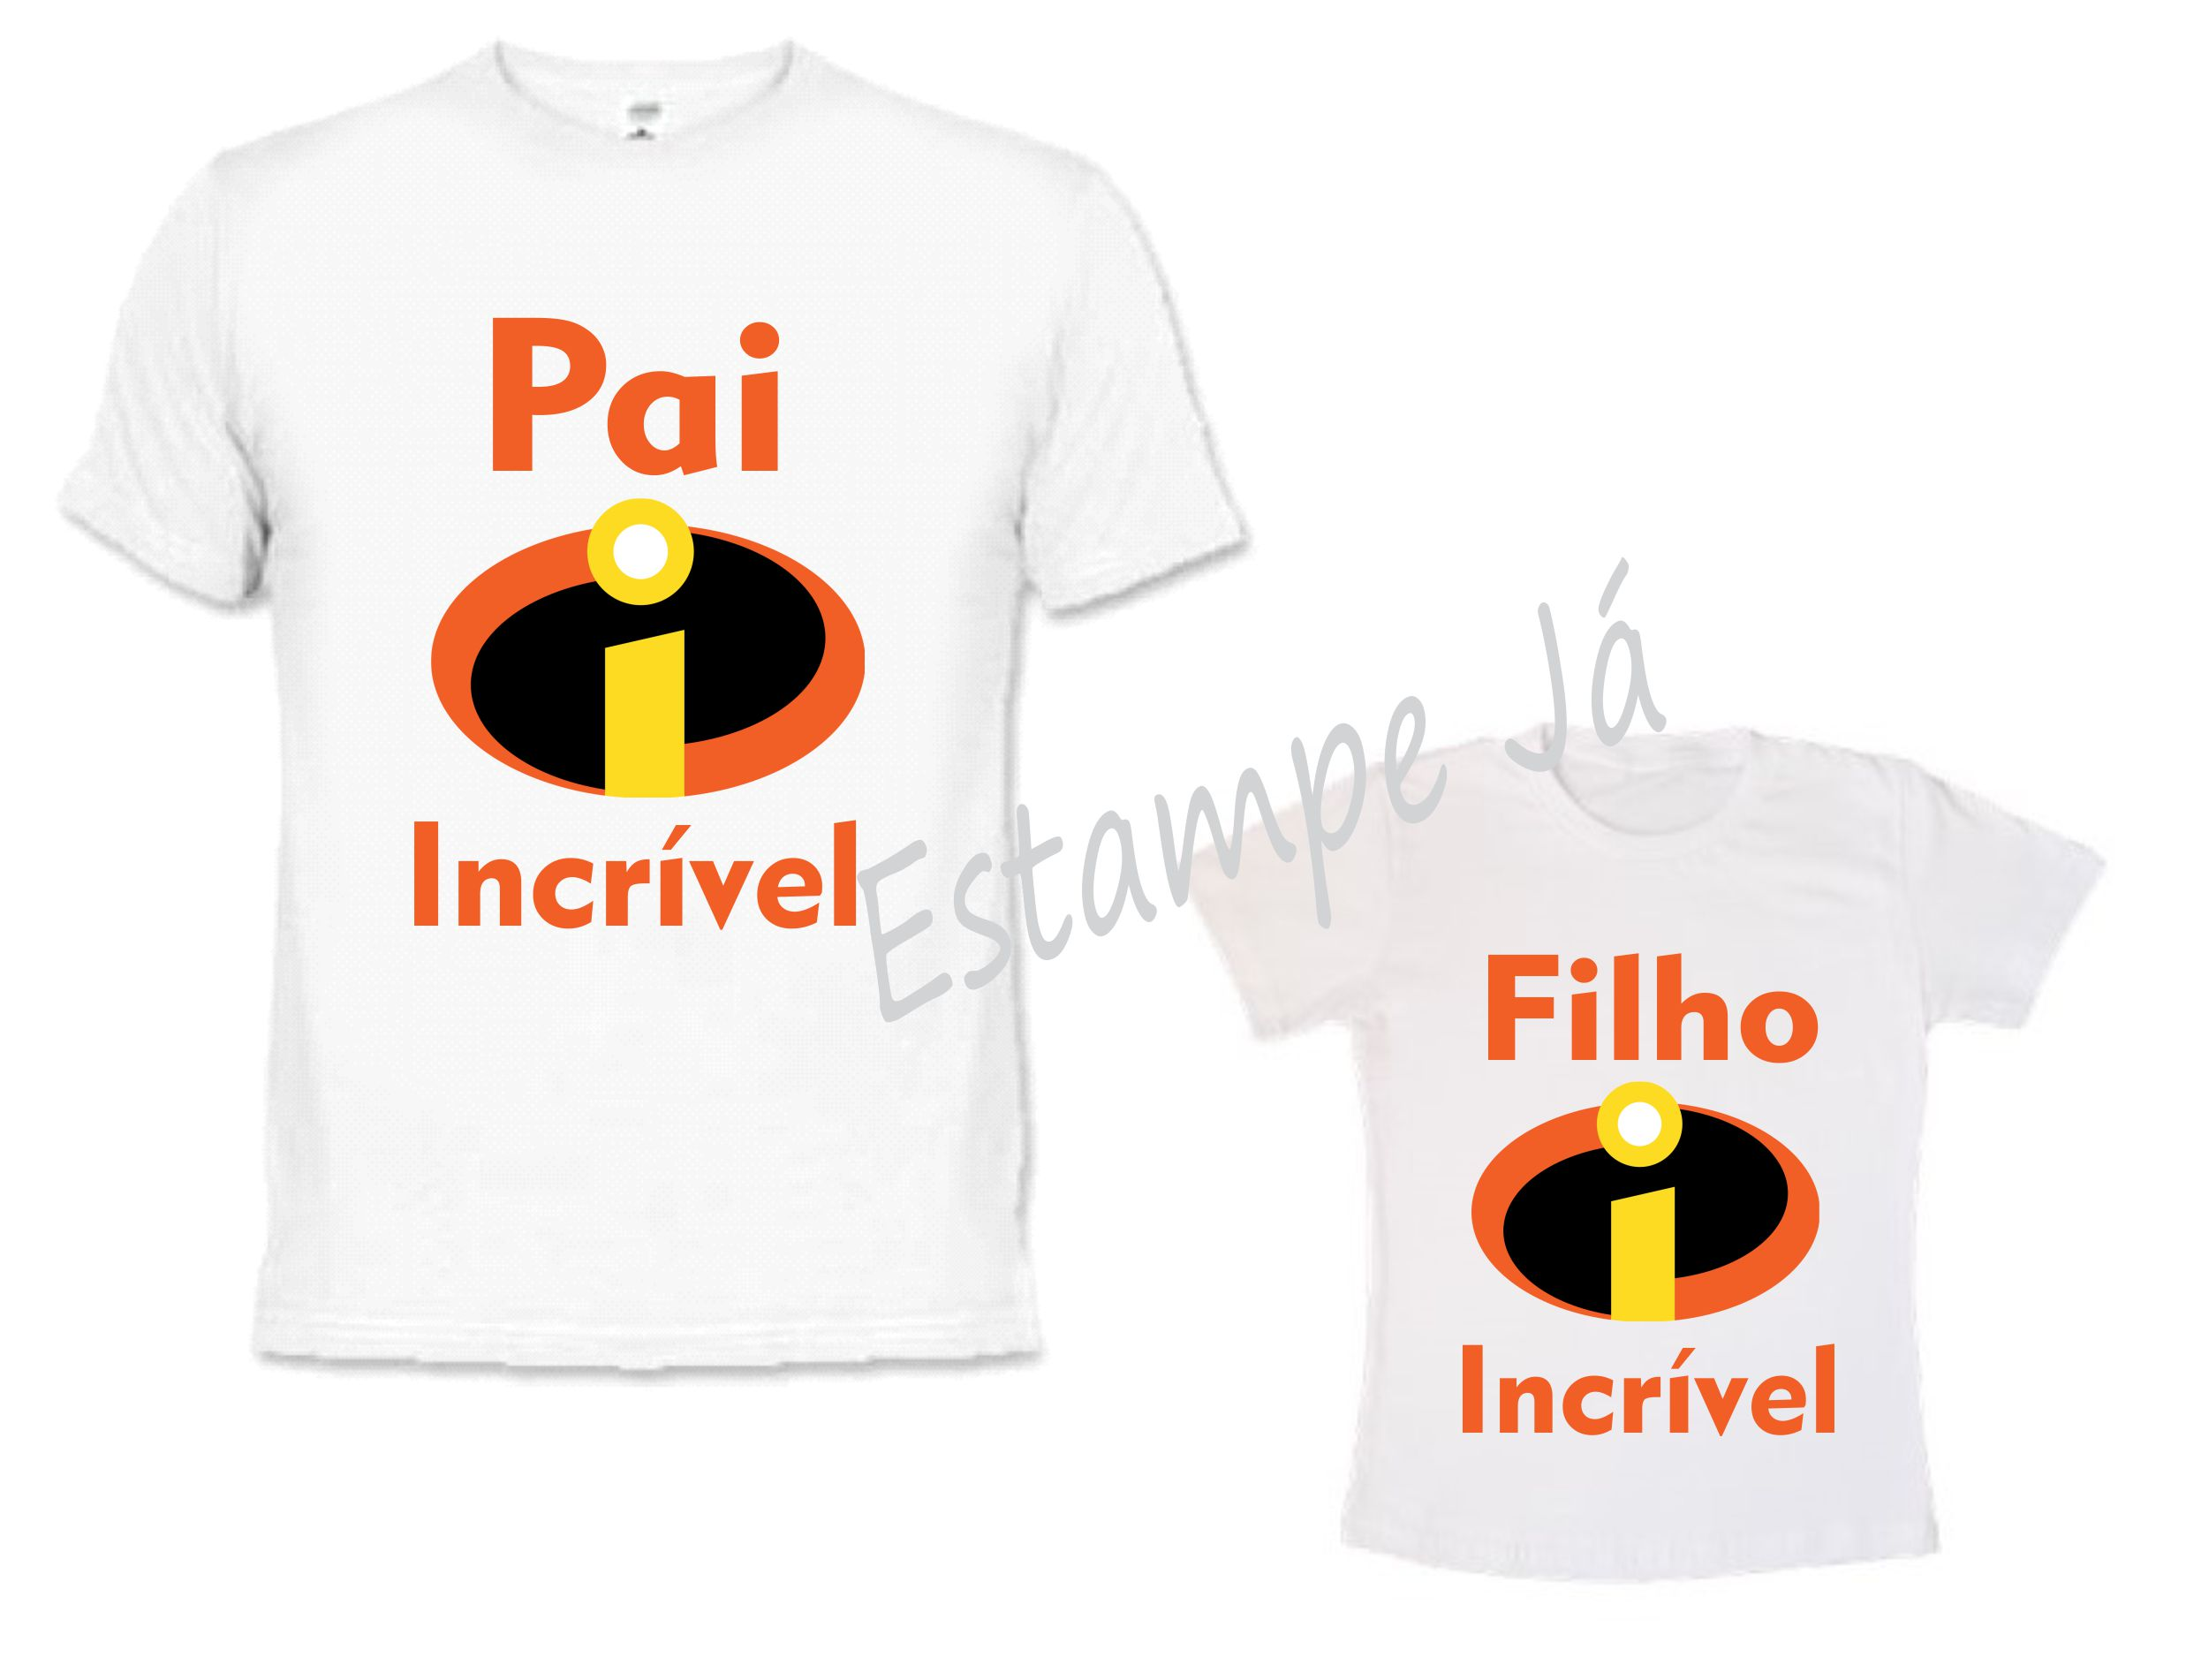 Camisetassuperpaisuperfilho  f7b183c3ab6f6